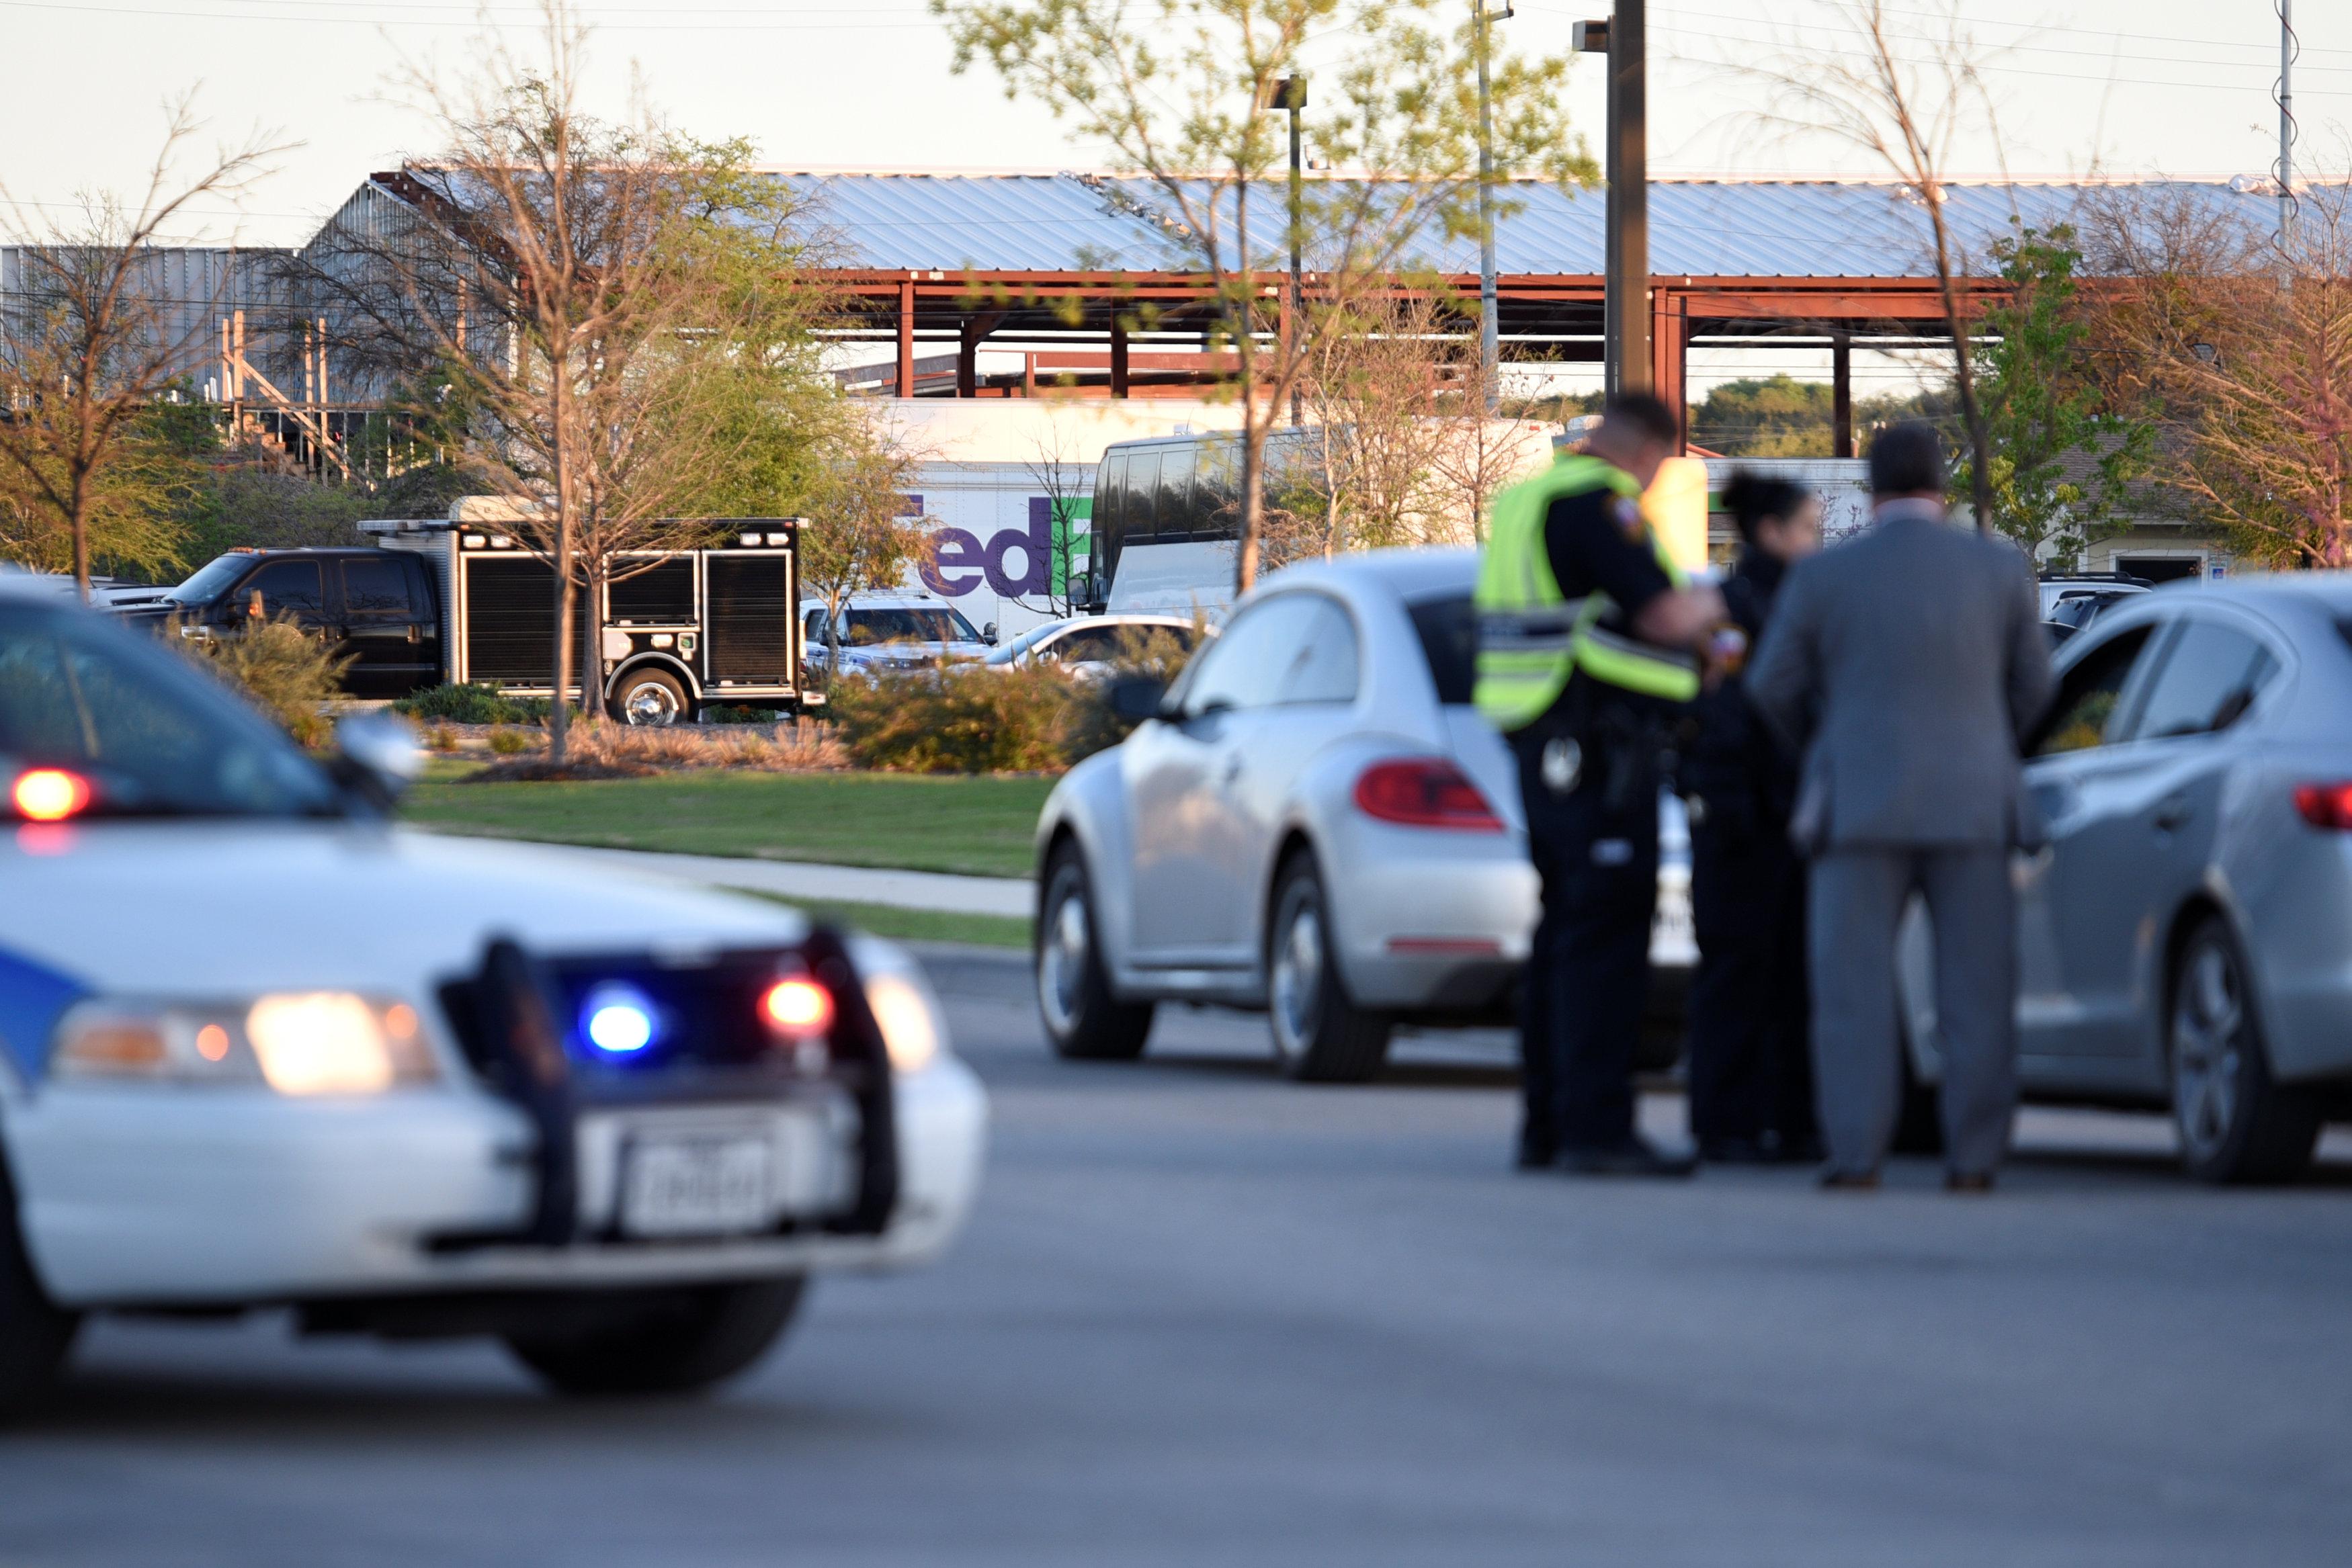 Schertz Police block off Doerr Lane near the scene of a blast at a FedEx facility in Schertz, Texas, U.S., March 20, 2018. REUTERS/Sergio Flore